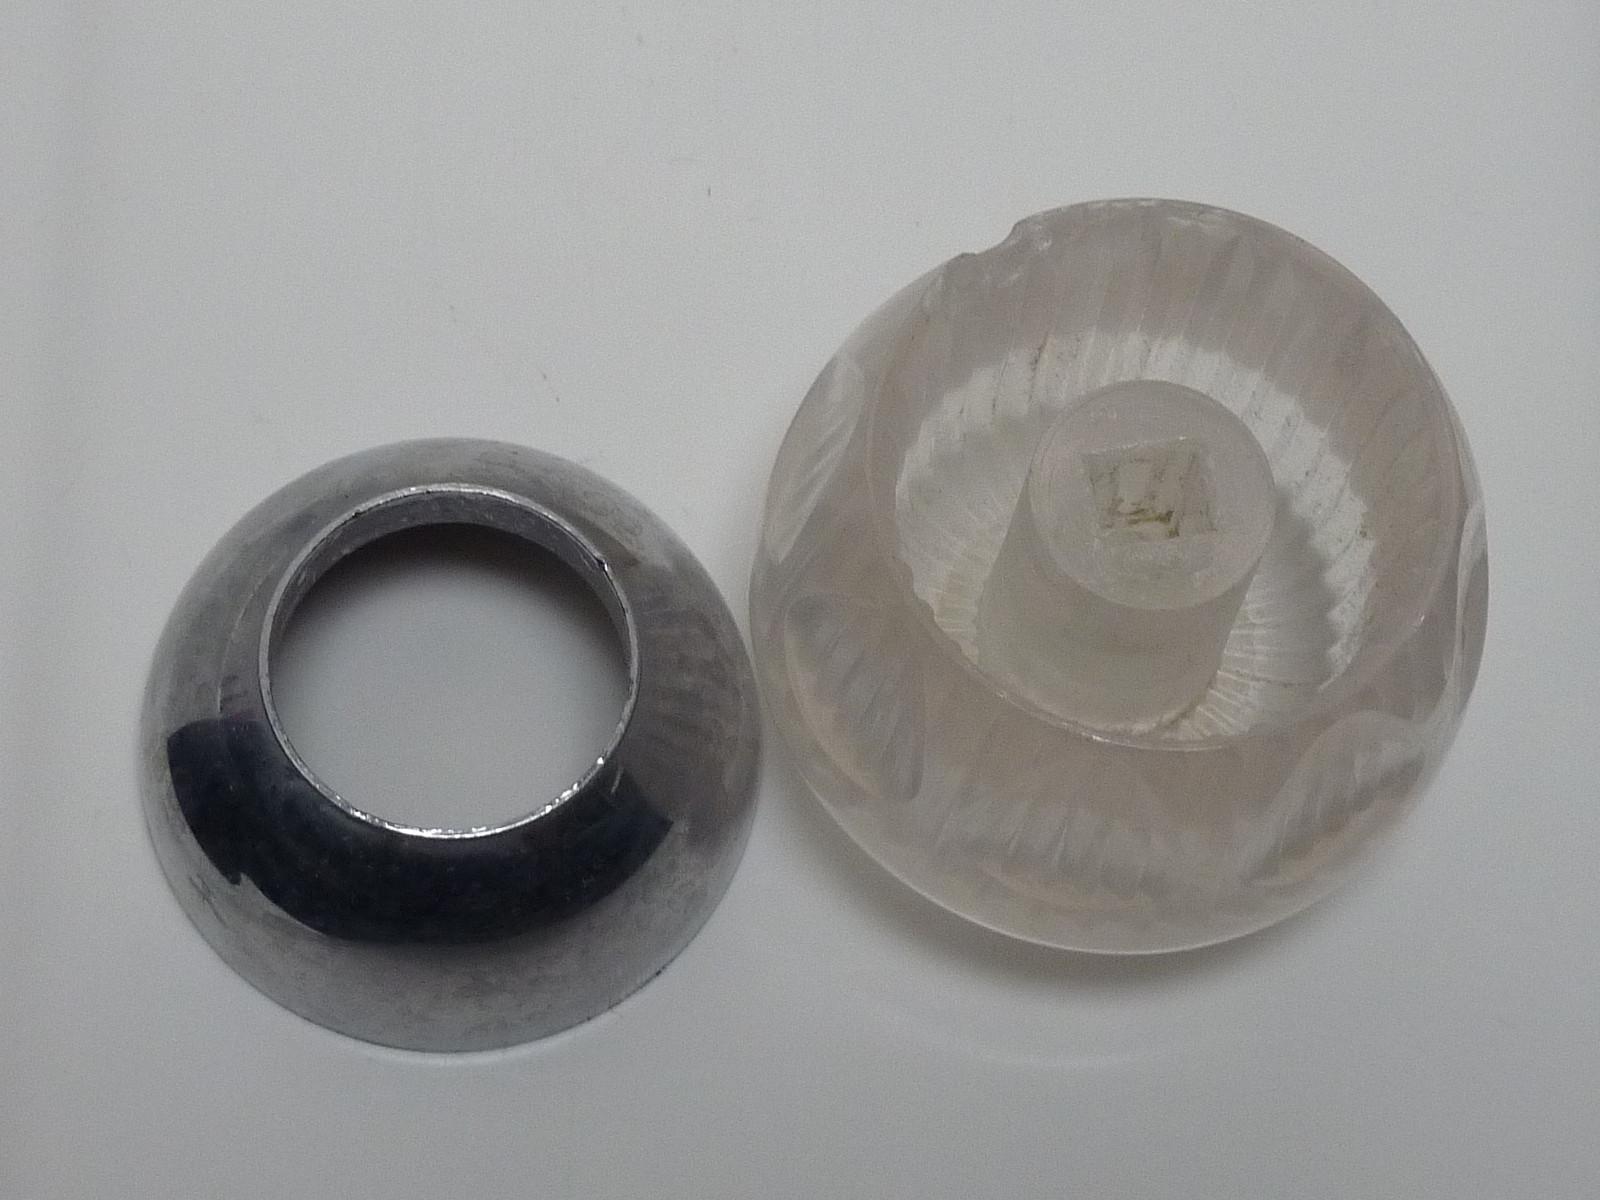 replace the broken knob handle